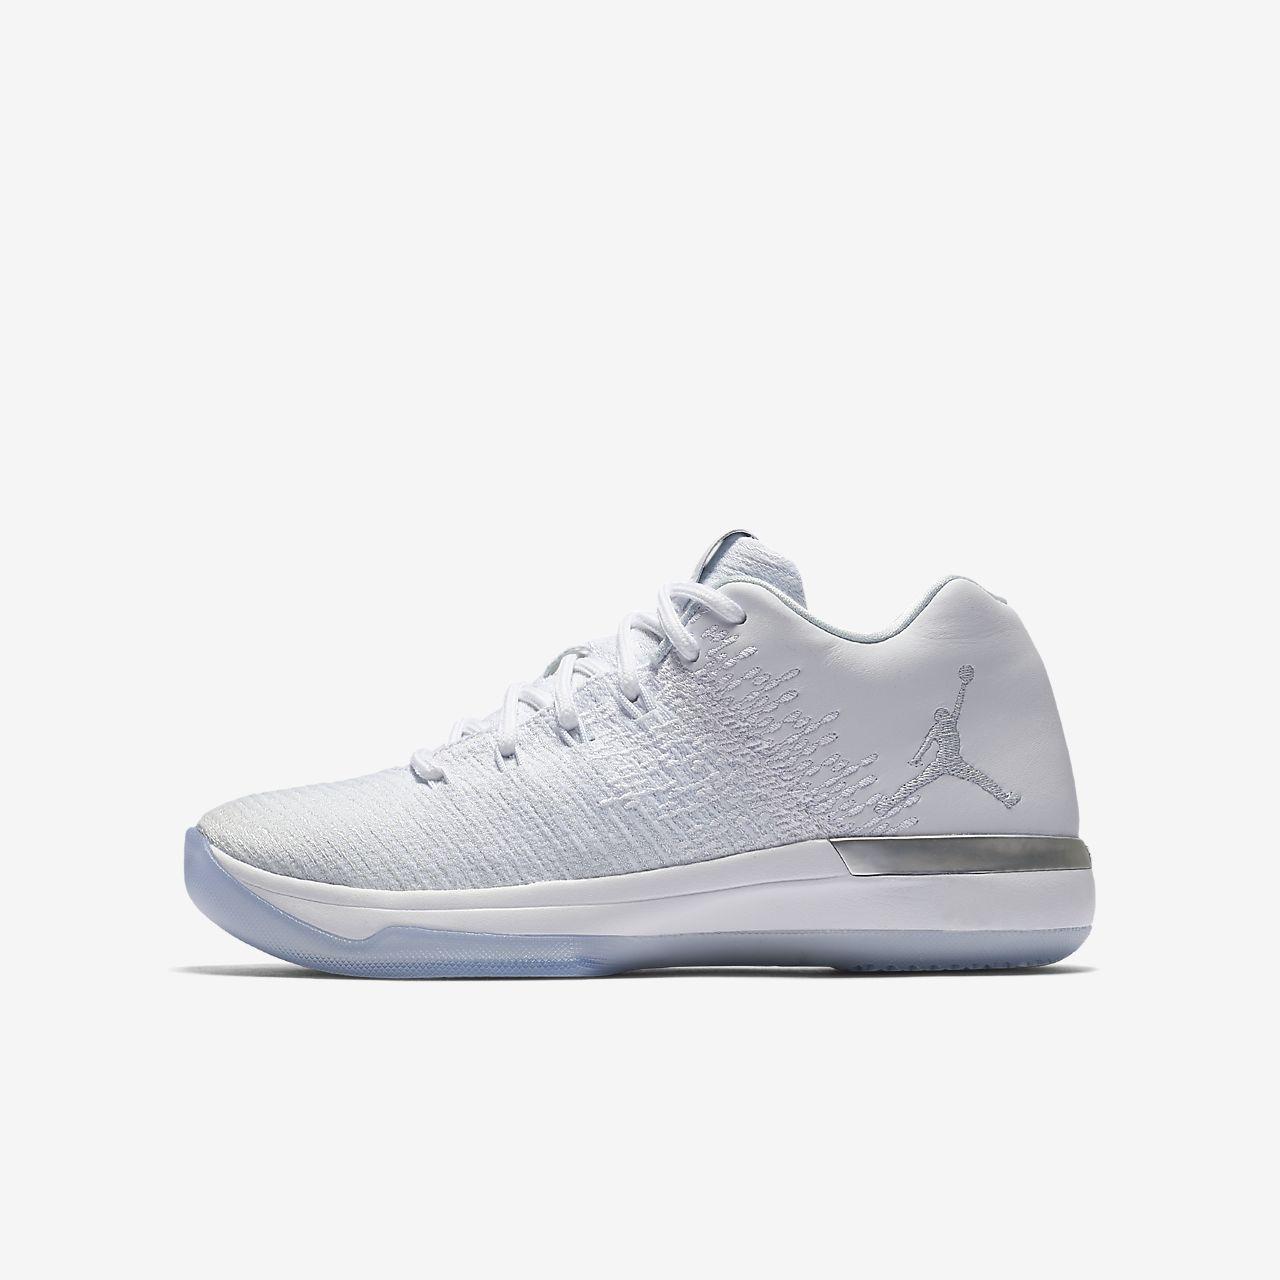 aa5e9f8b81e7d5 Air Jordan XXXI Low Older Kids  Basketball Shoe. Nike.com SI